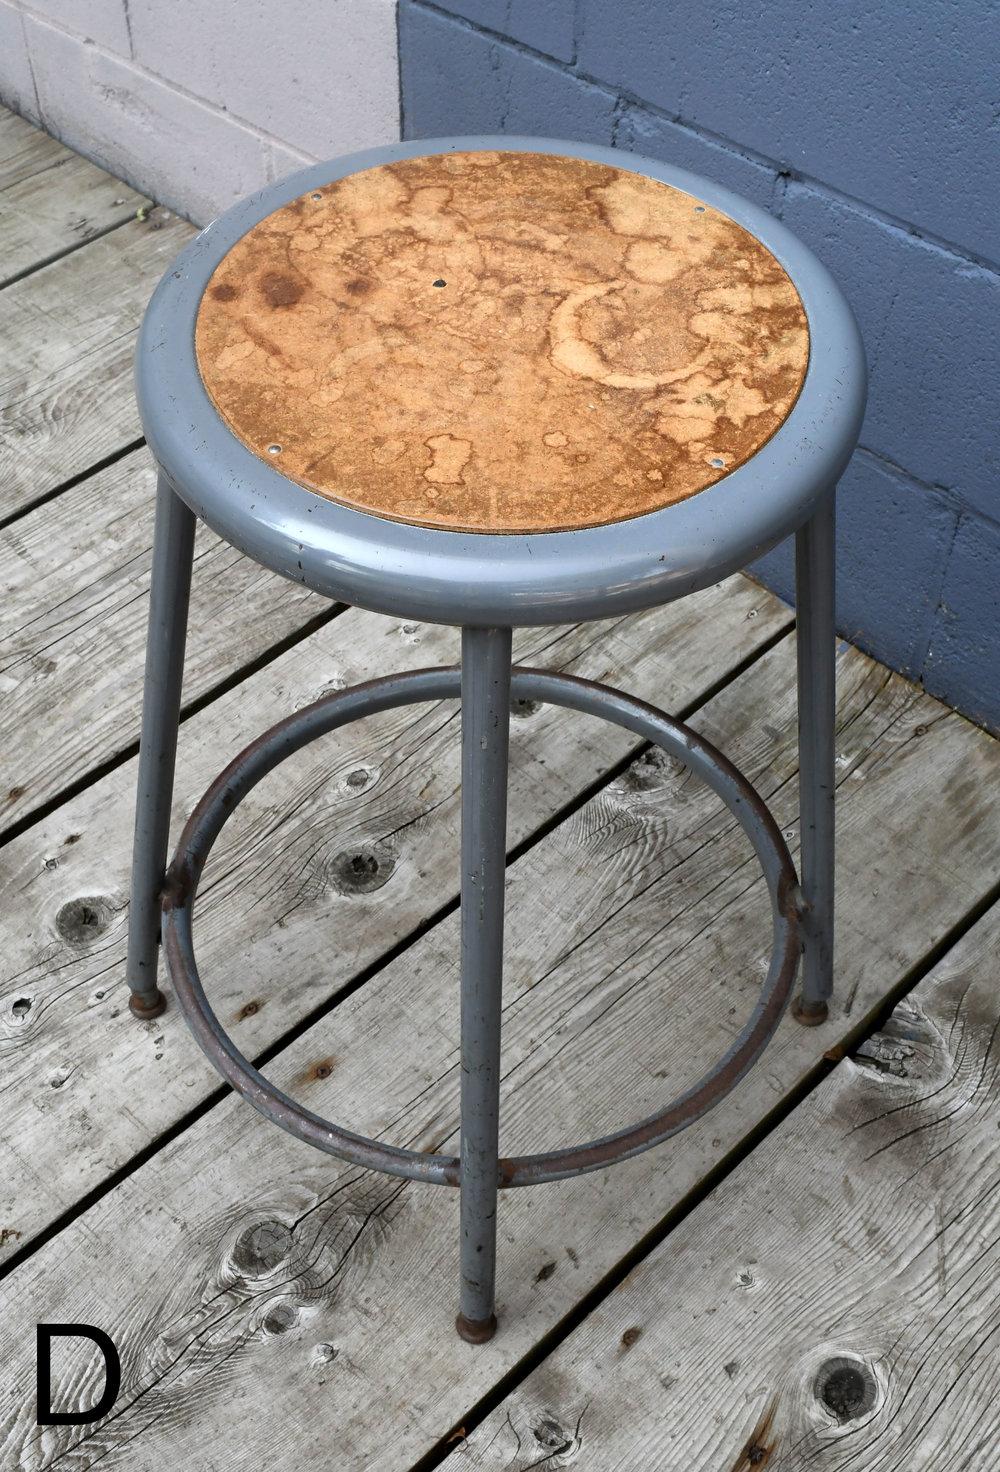 47340-art-school-stools-variation-D-with-letter.jpg